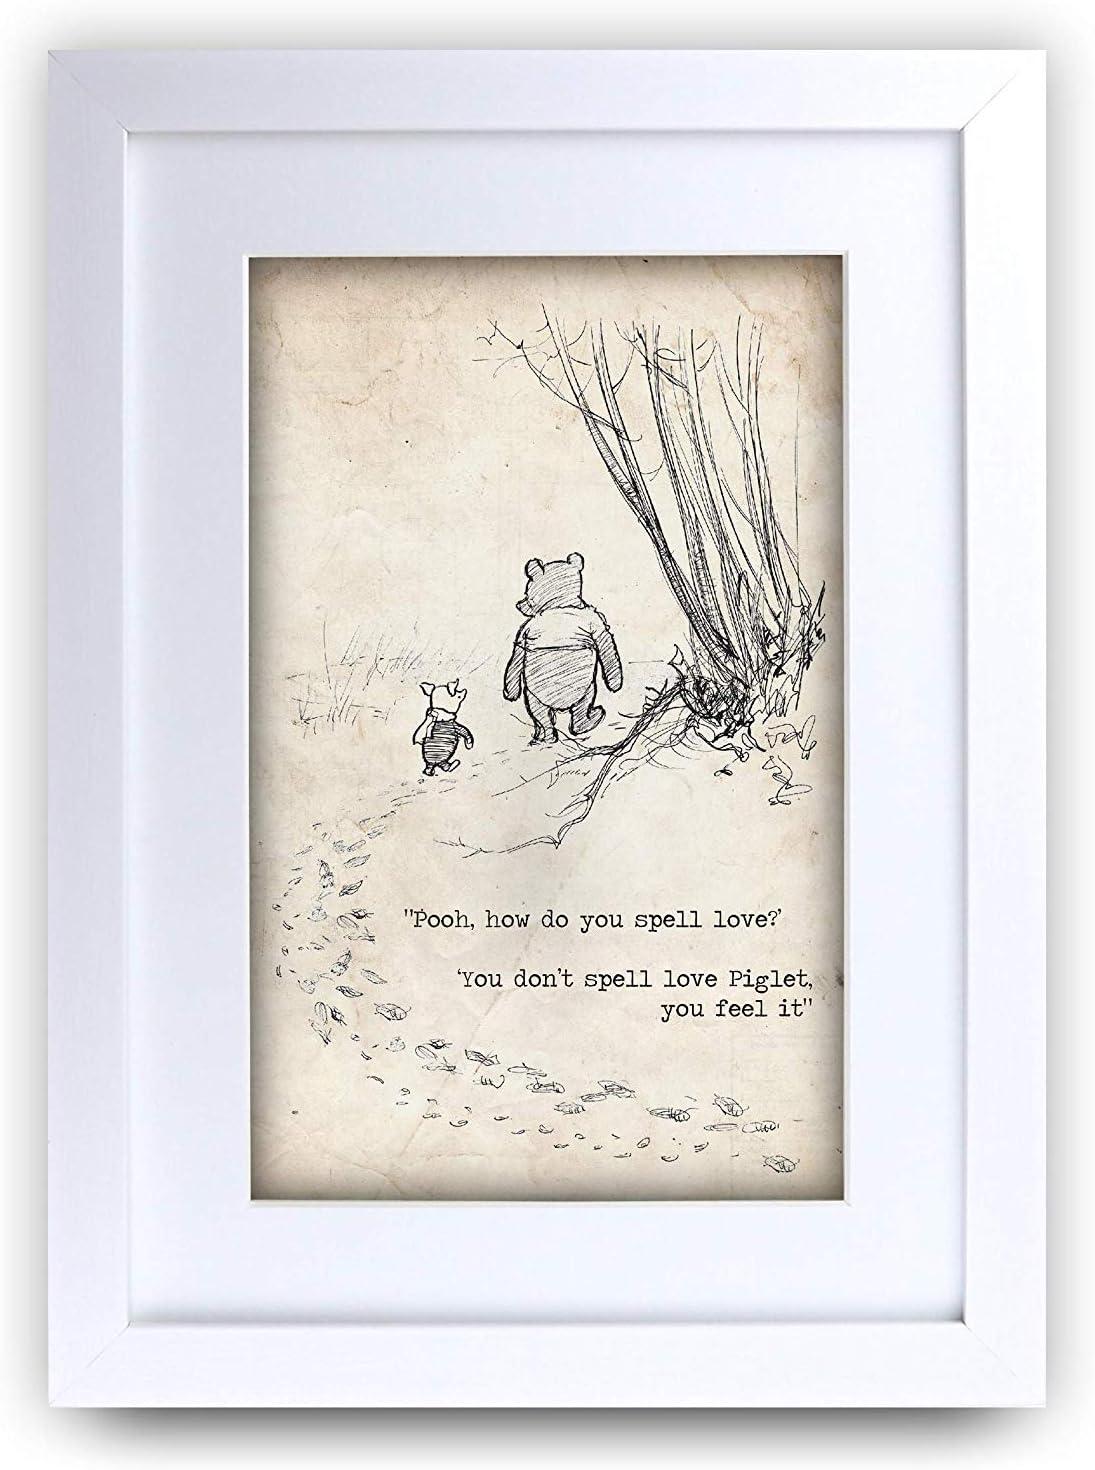 Marco de fotos con cita impresa en tama/ño A4 HWC Trading FR Winnie the Pooh Spell Feel Love